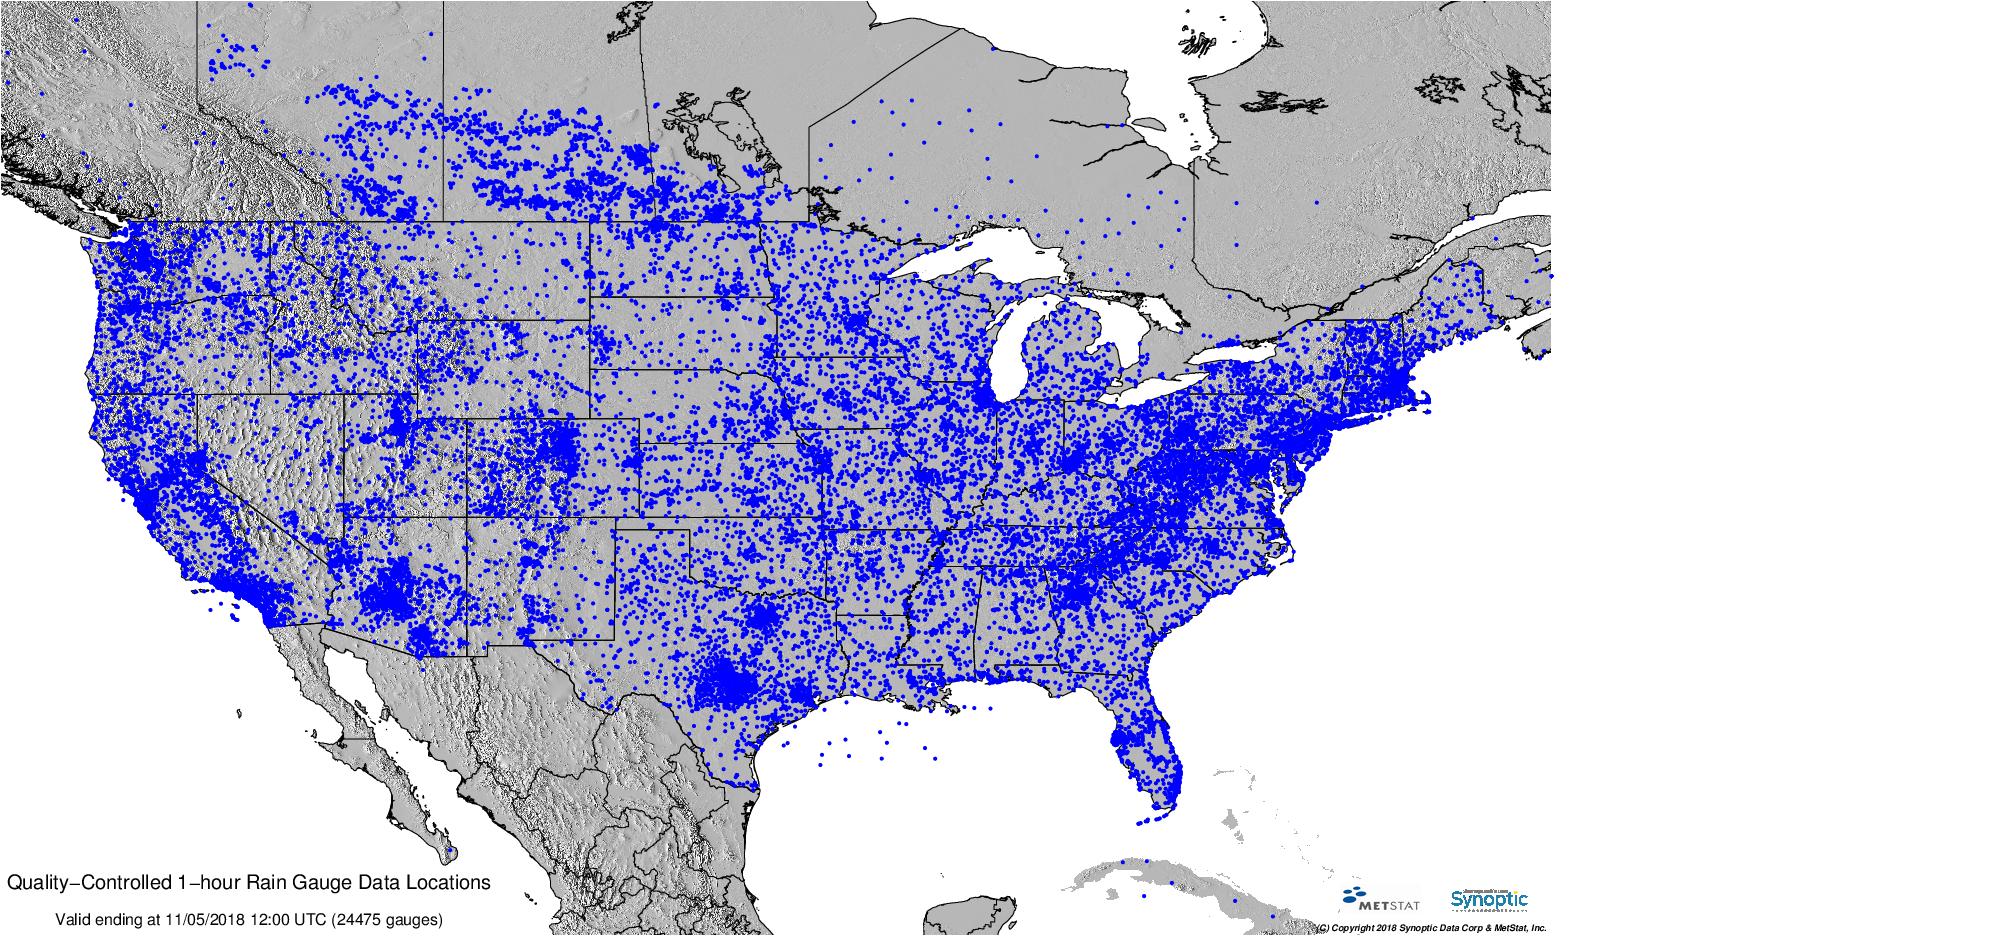 metstat_qcd_rain_gauge_map.png